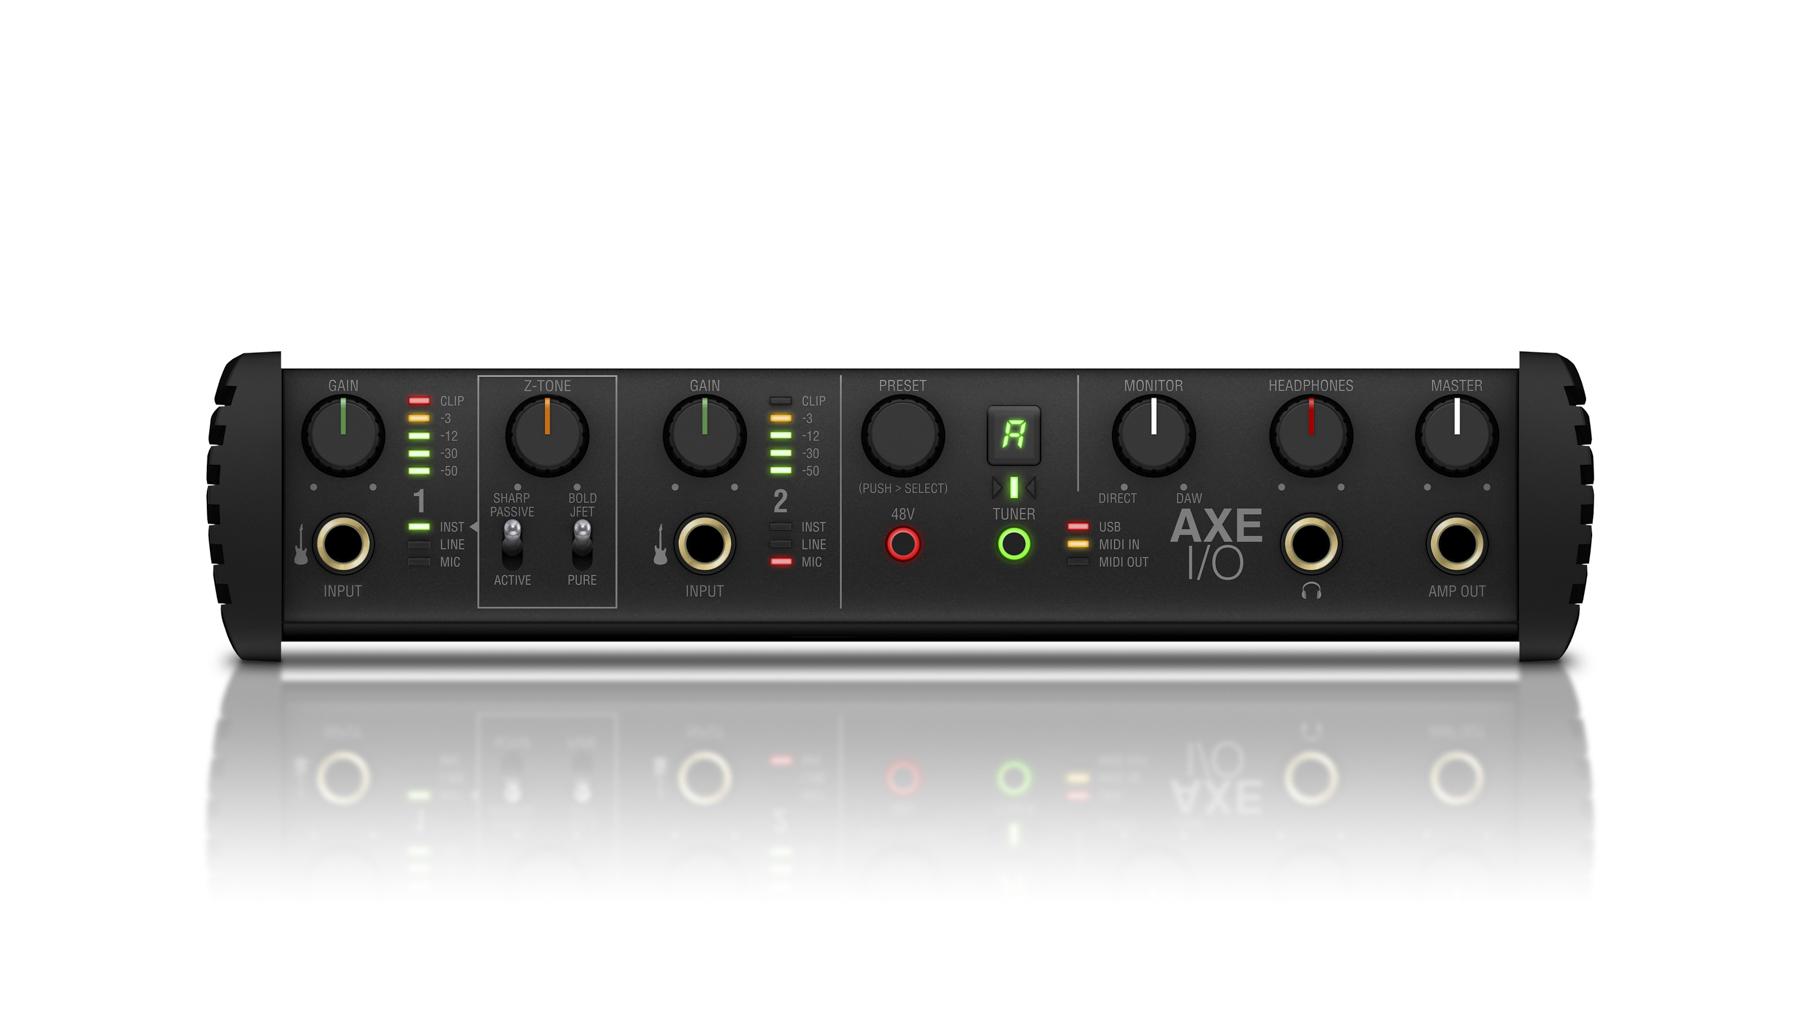 News: IK Multimedia präsentiert für Gitarristen entwickeltes Audio-Interface AXE I/O